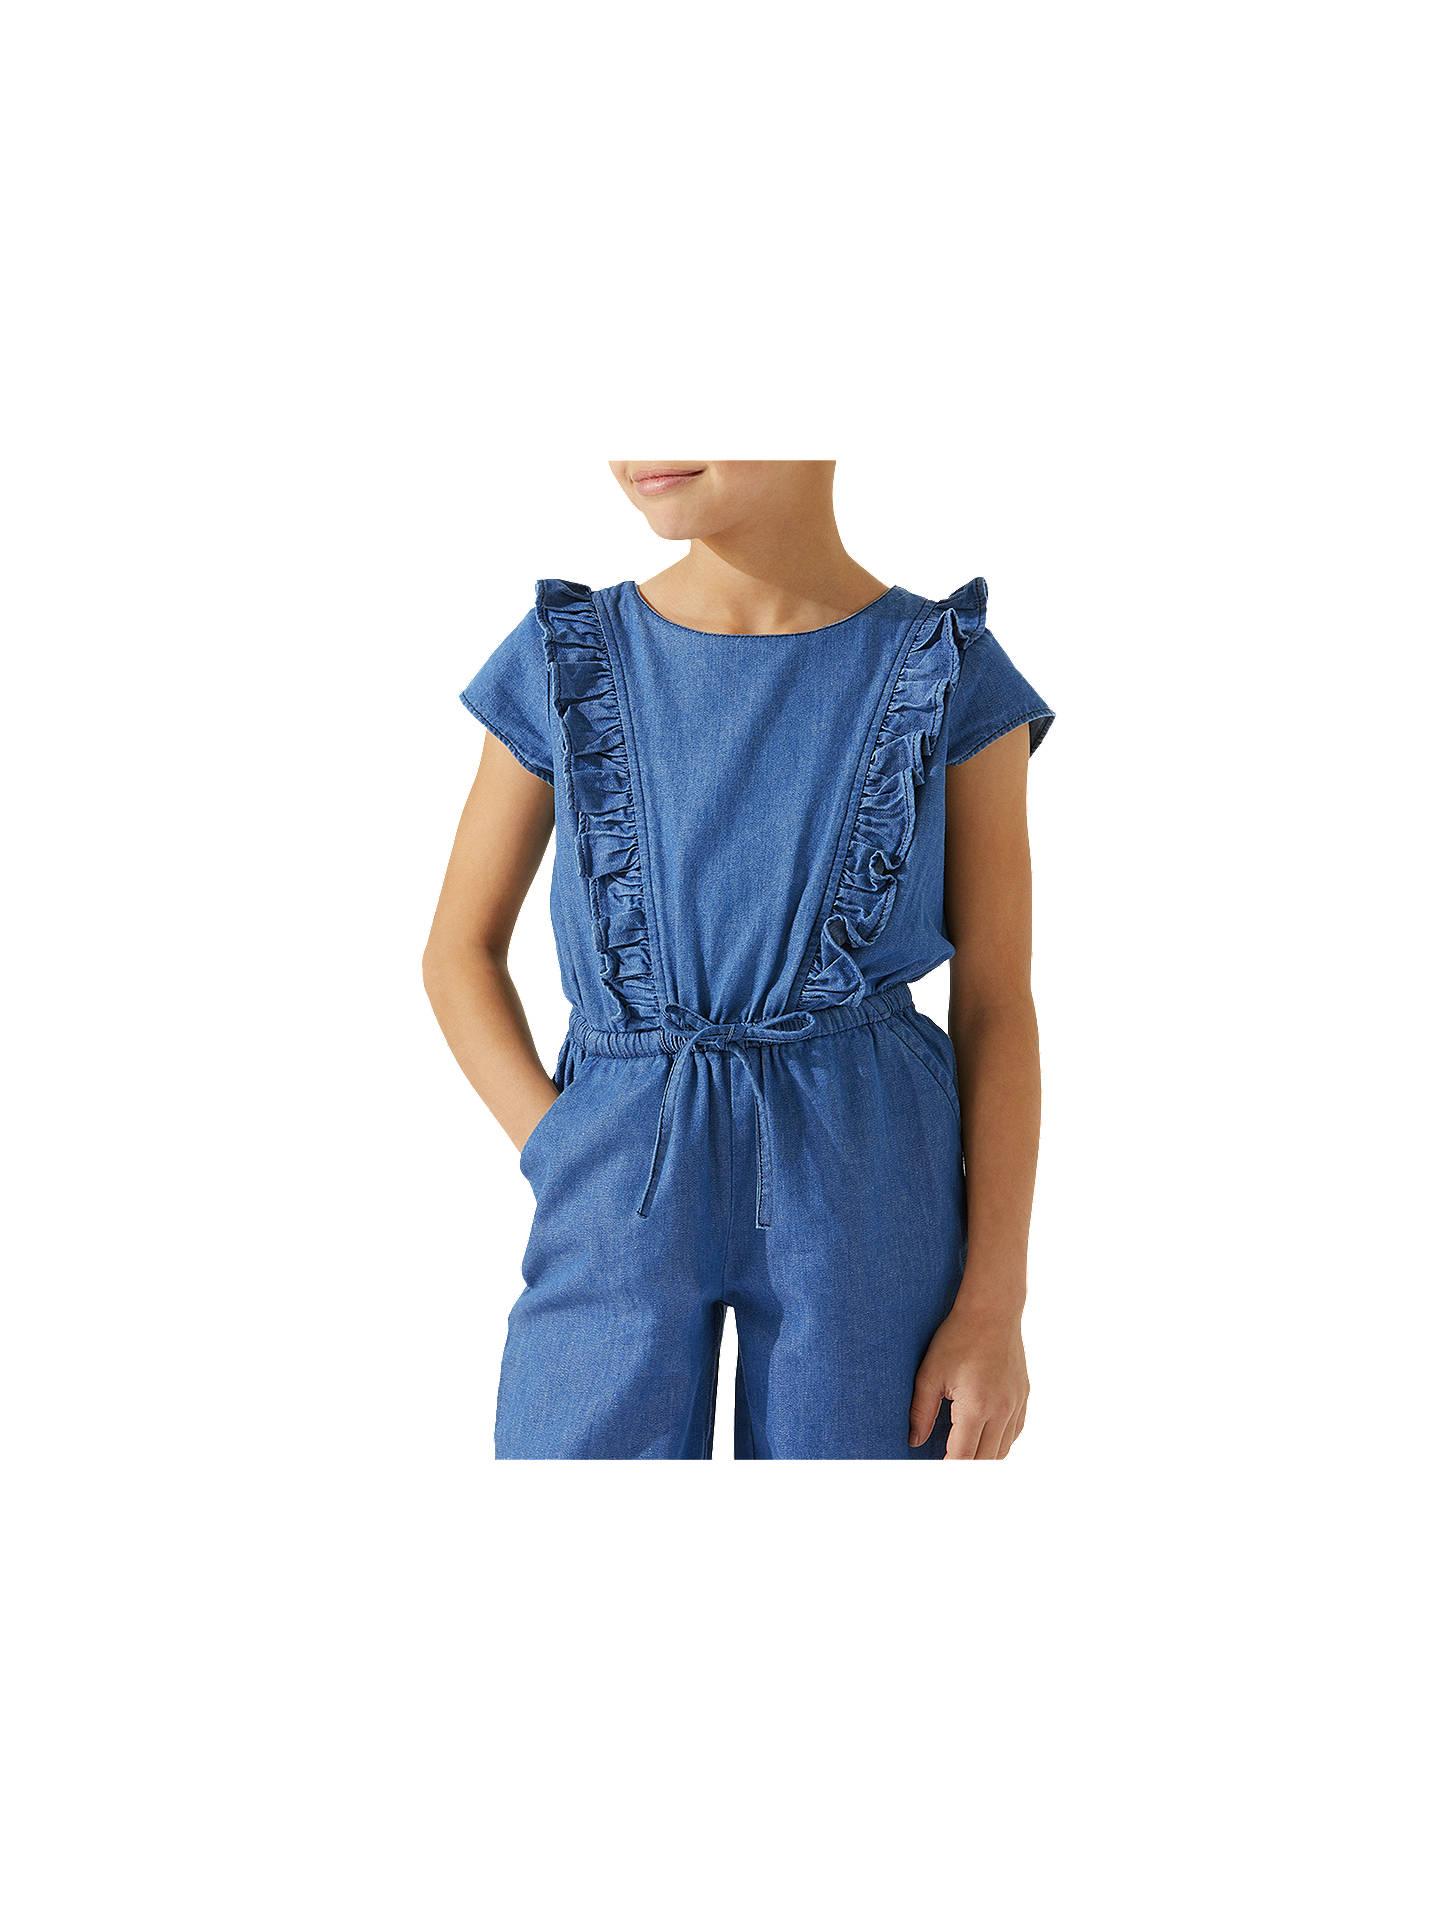 b2a310df0a ... Buy Jigsaw Girls  Chambray Jumpsuit